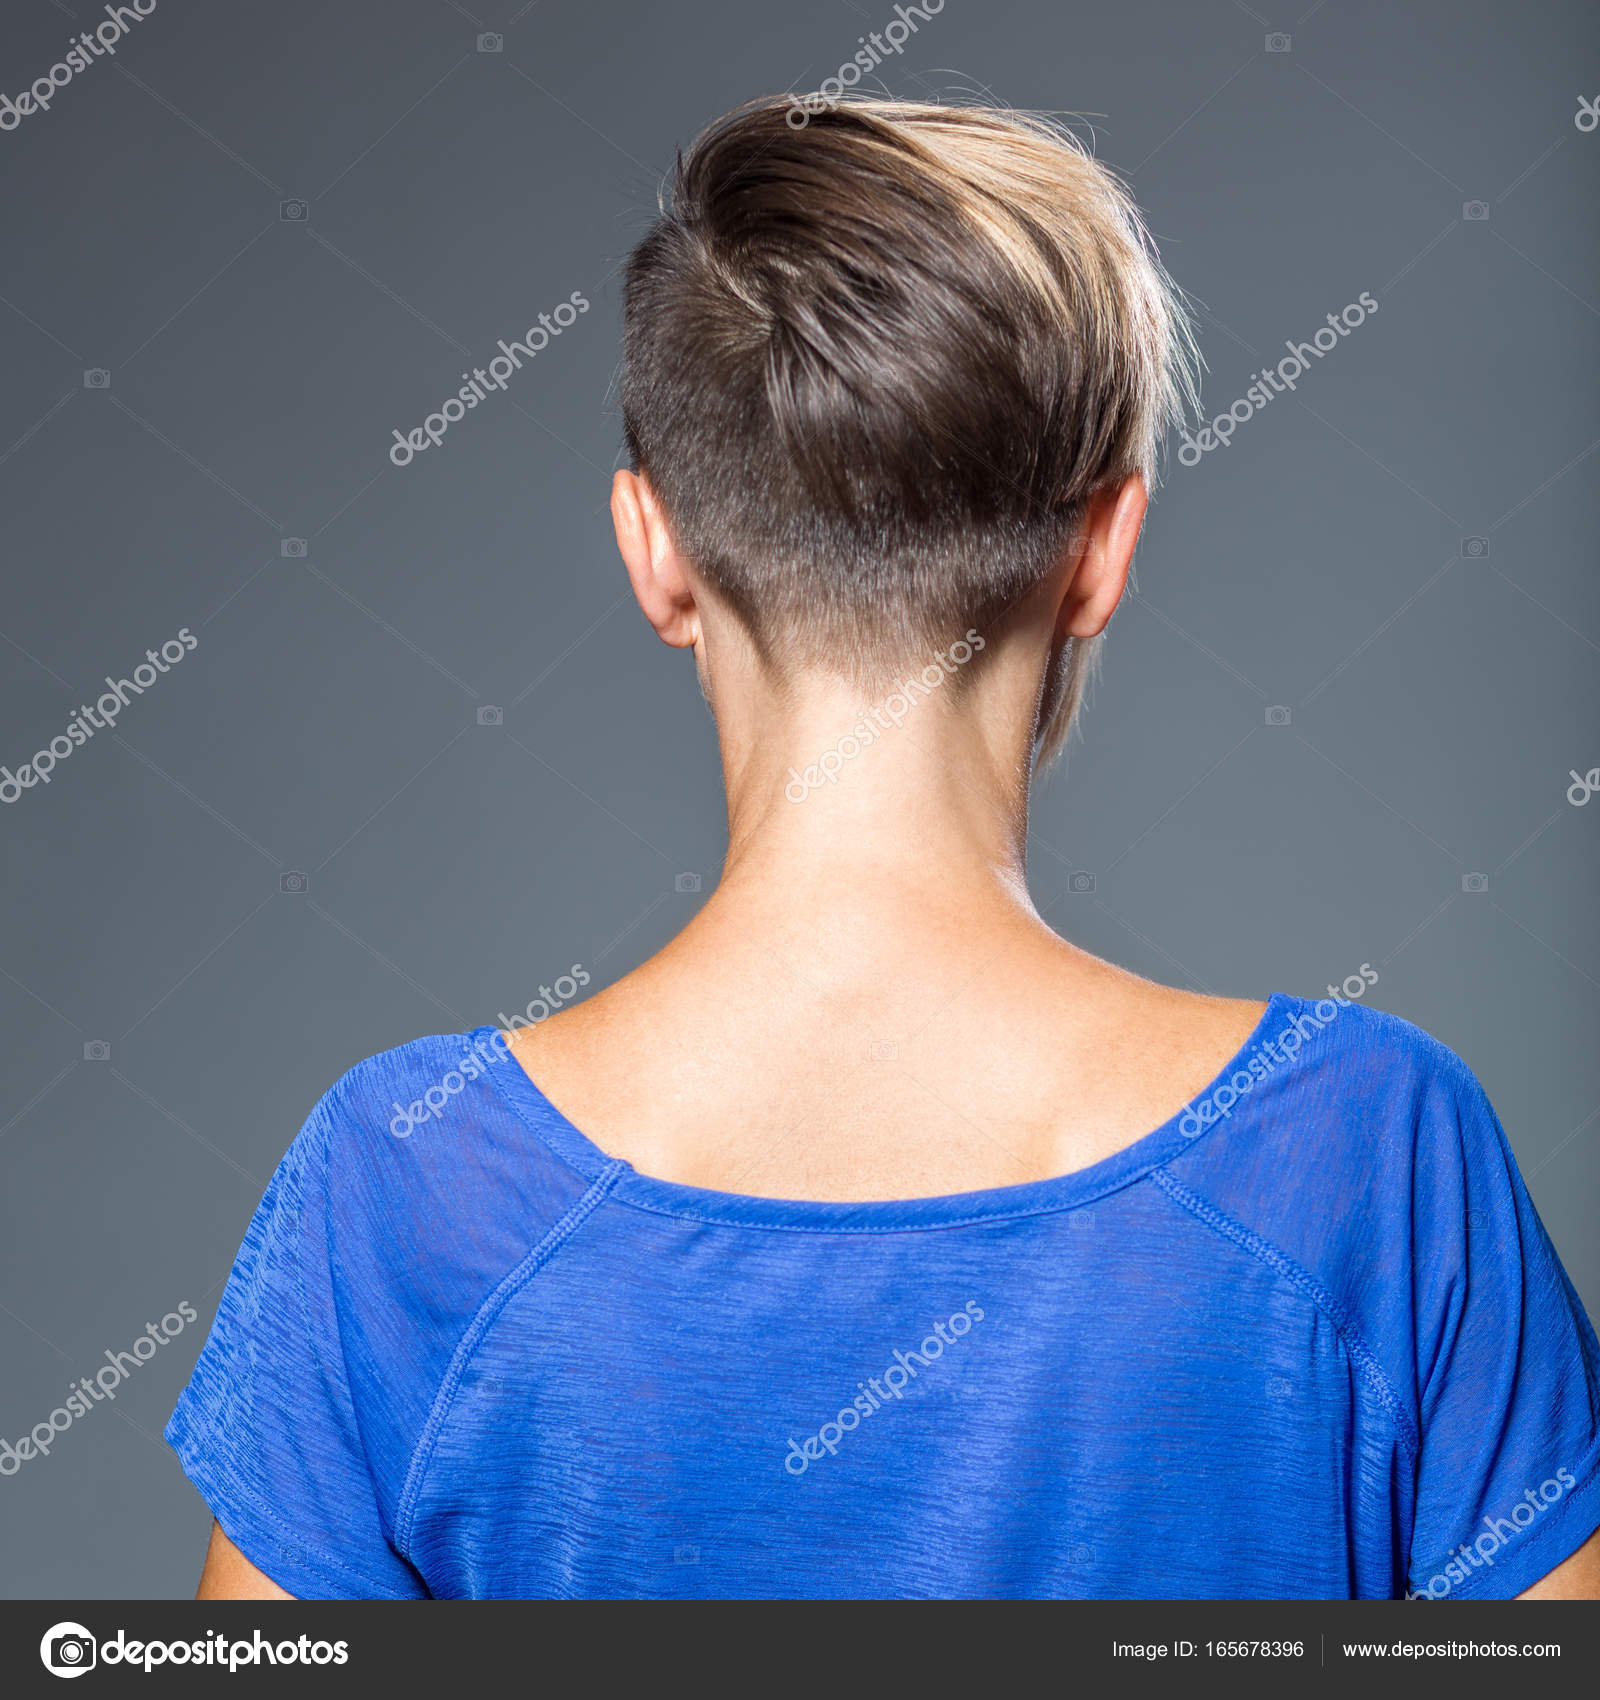 Corte De Pelo Peinado Mujer Con Pelo Corto Foto De Stock - Corte-de-pelo-por-detrs